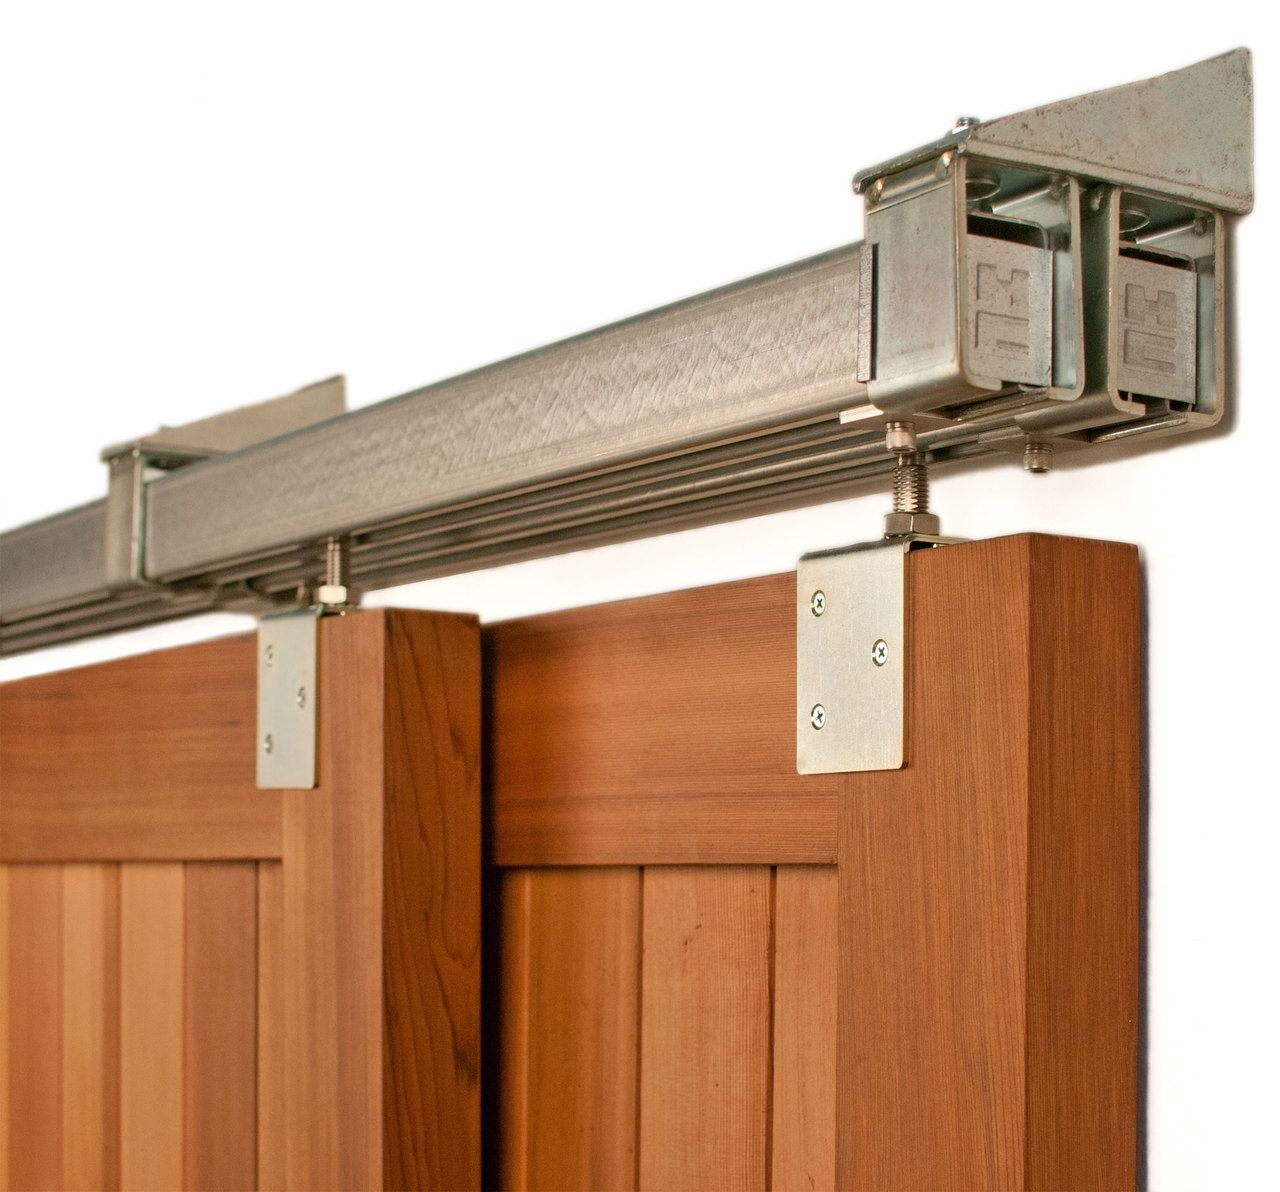 Superb Heavy Duty Industrial Bypass Box Rail Barn Door Hardware (500lb+)   Real  Sliding Hardware